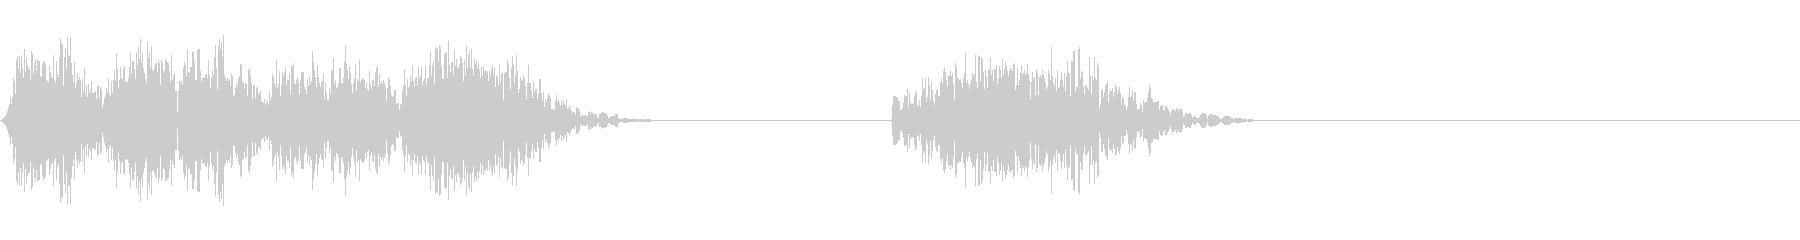 DJスクラッチ05_リバース音05の未再生の波形